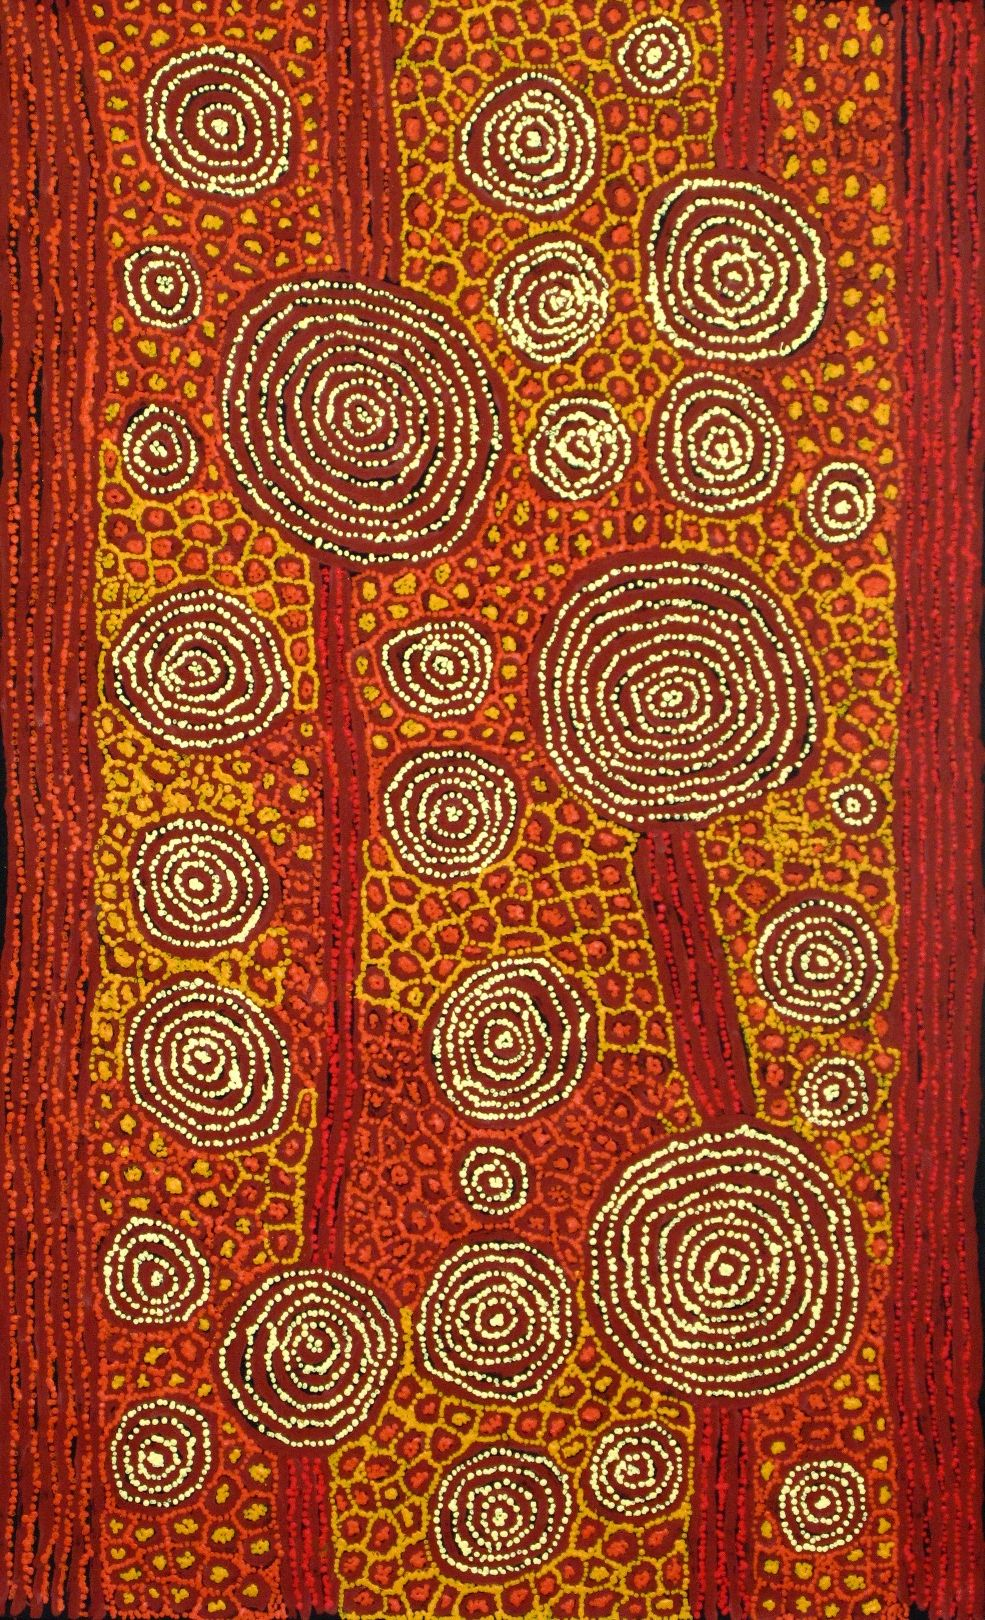 art edaboriginal art on pinterest dot painting